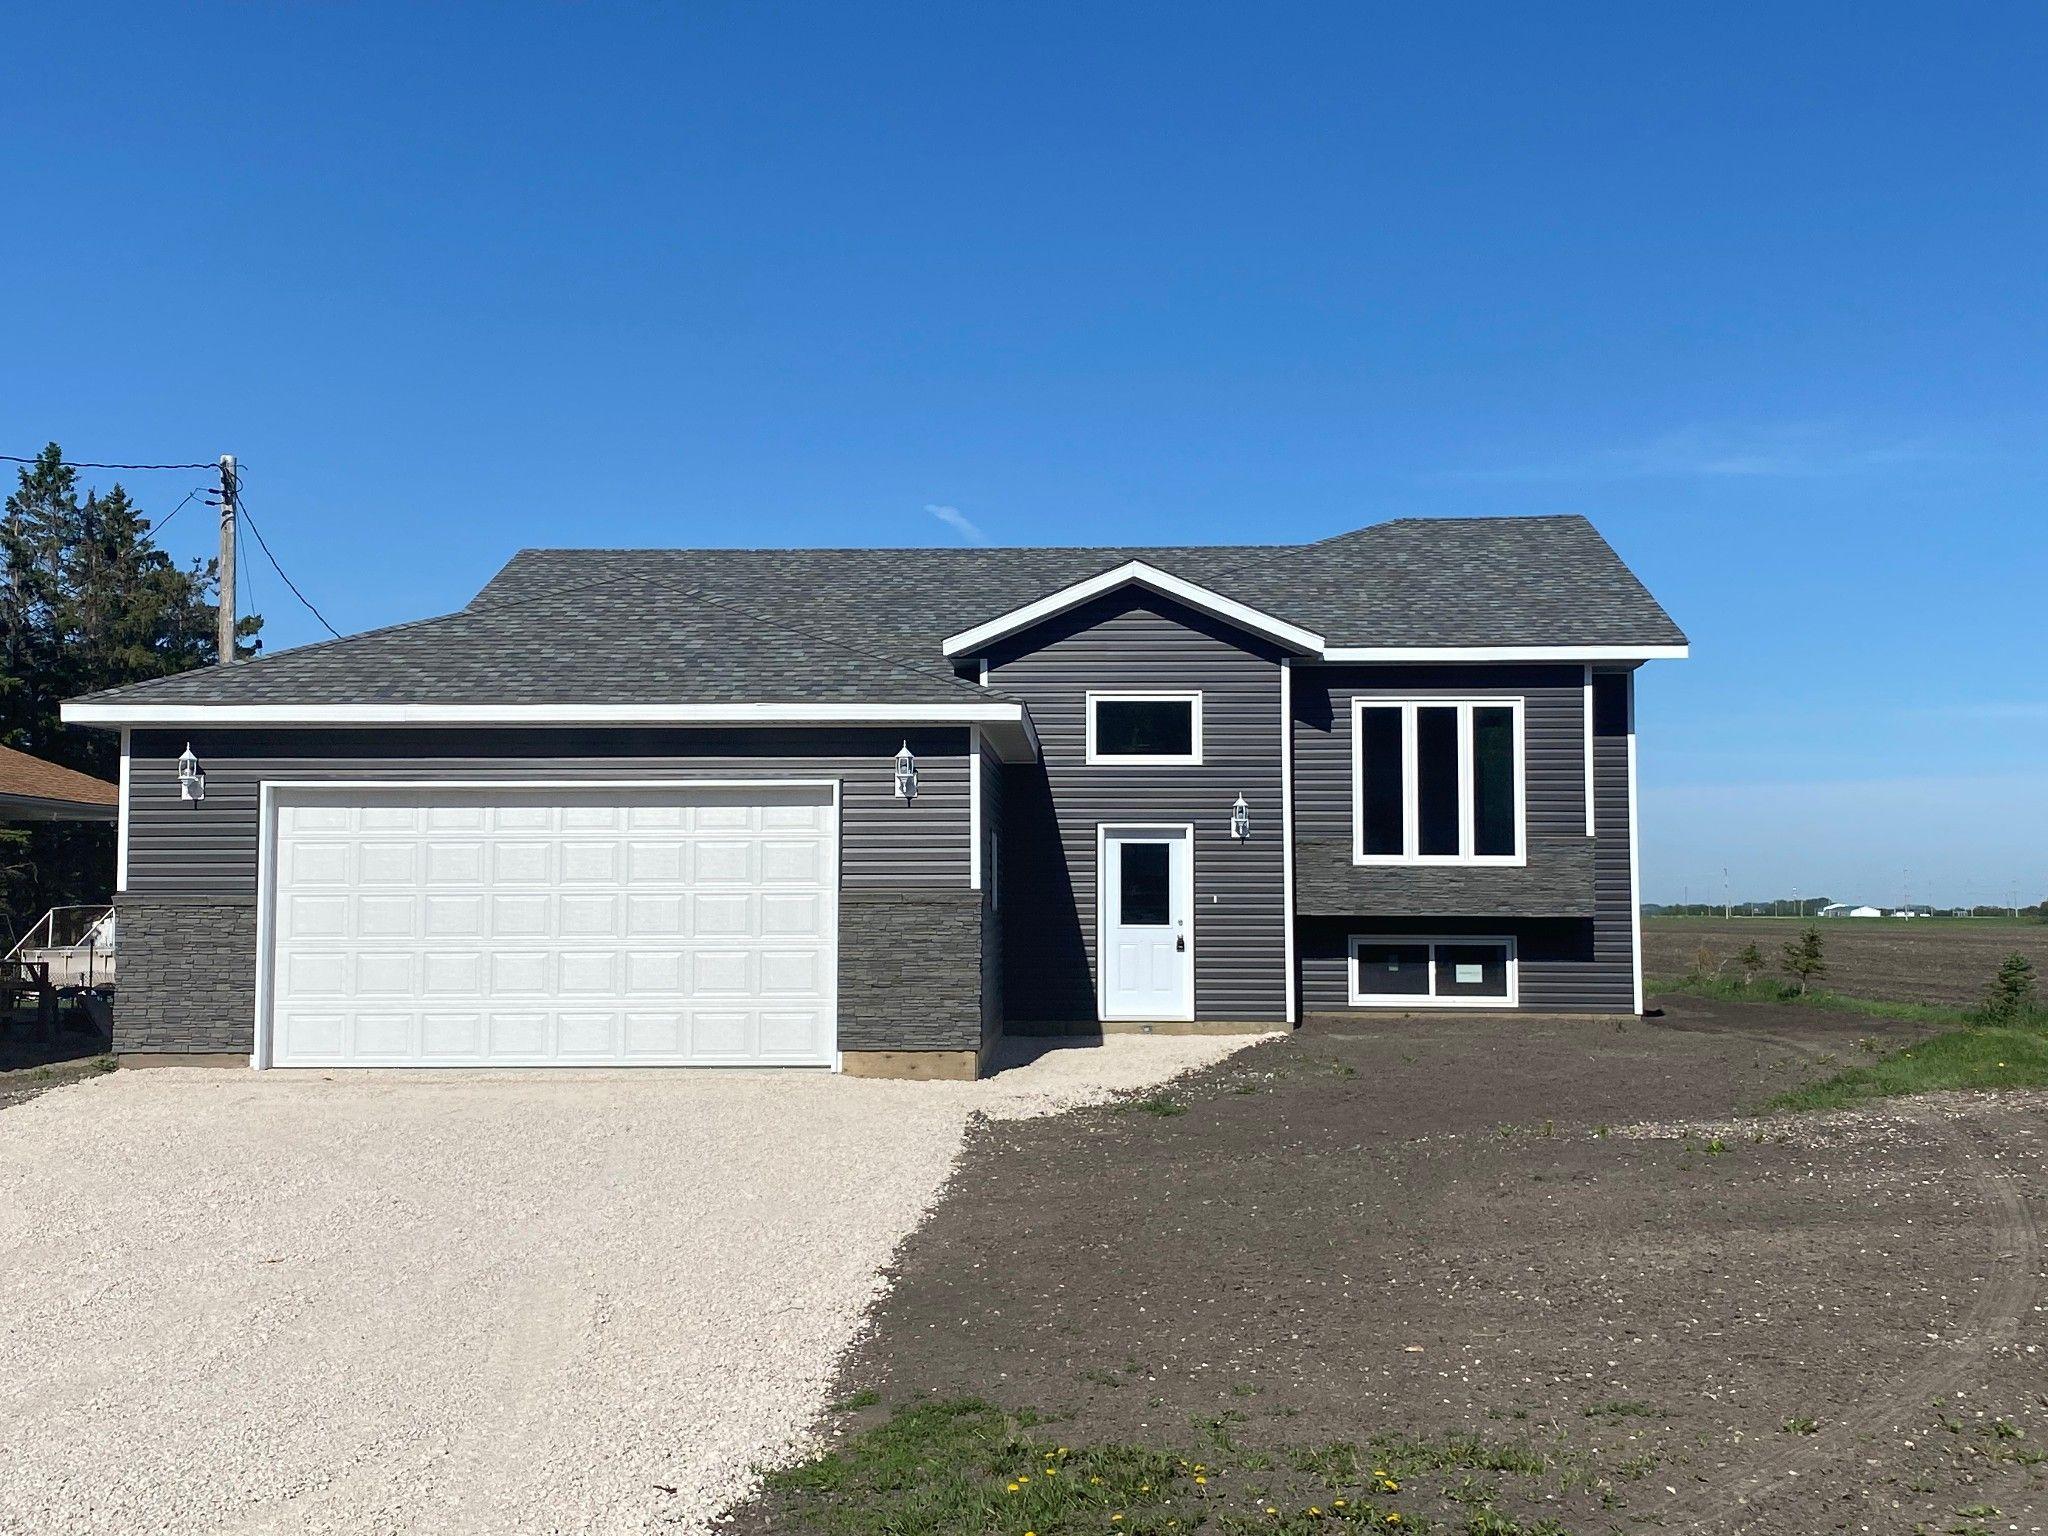 Main Photo: 85 Wilson Street in Portage la Prairie RM: House for sale : MLS®# 202025150